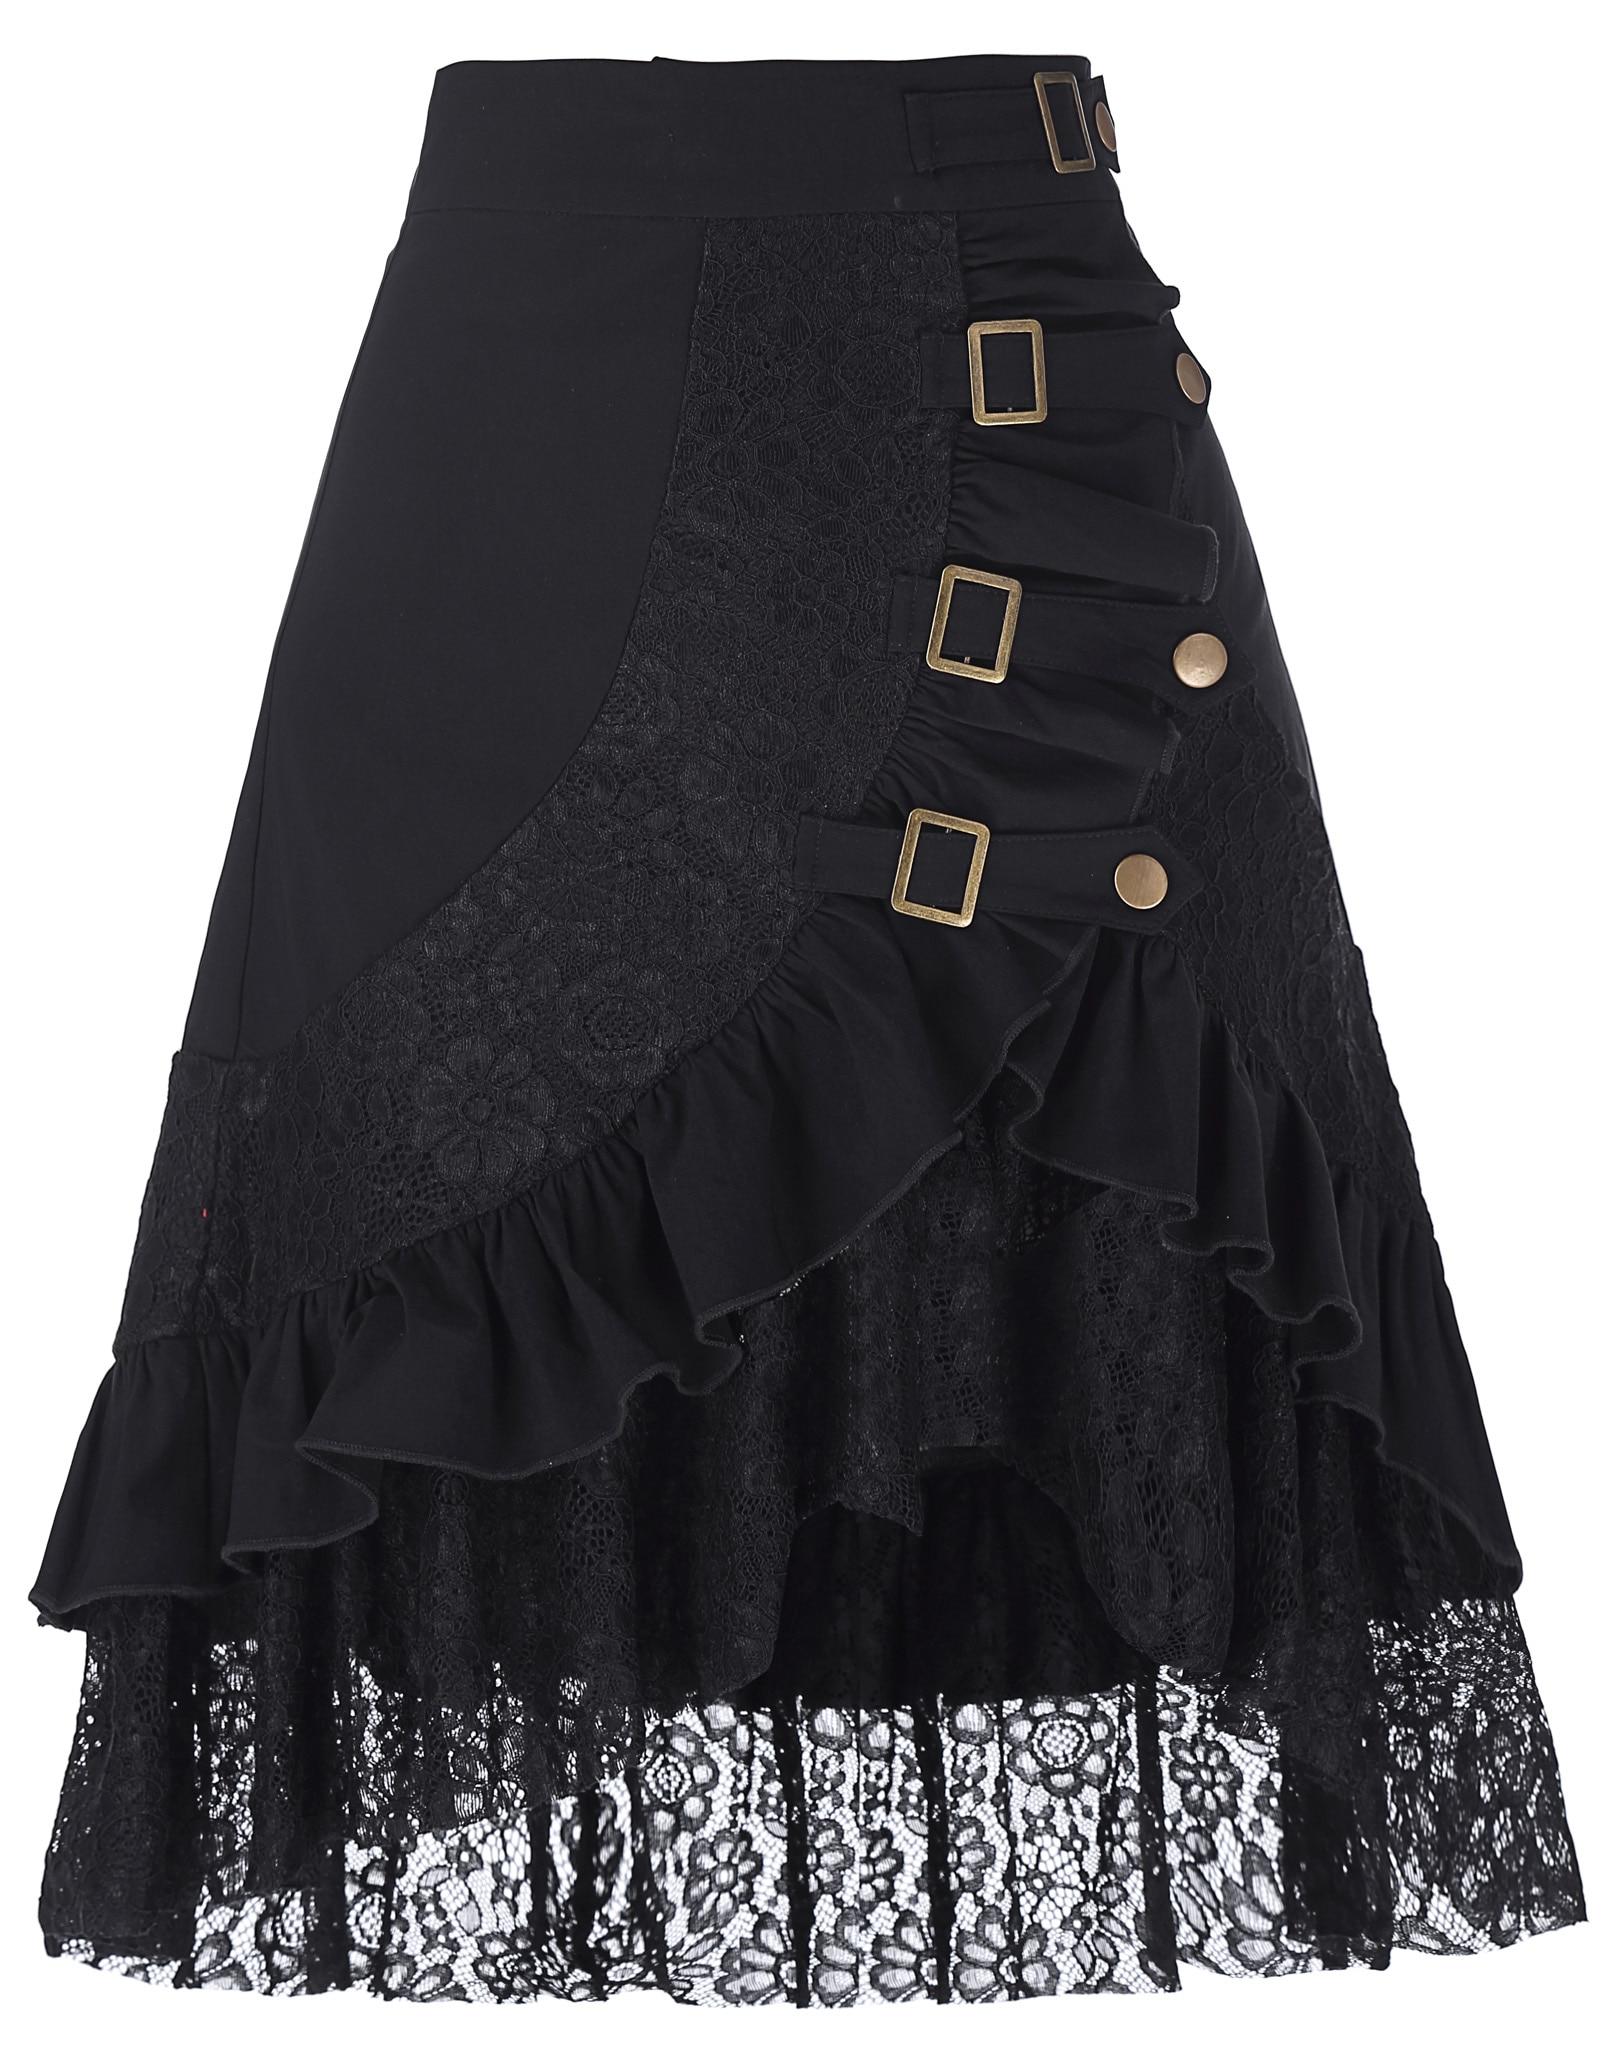 Vintage Women Steampunk Gothic Clothing Gypsy Hippie Skirt Femme Falda Corta medieval Harajuku sexy rock black lace Metal skirt